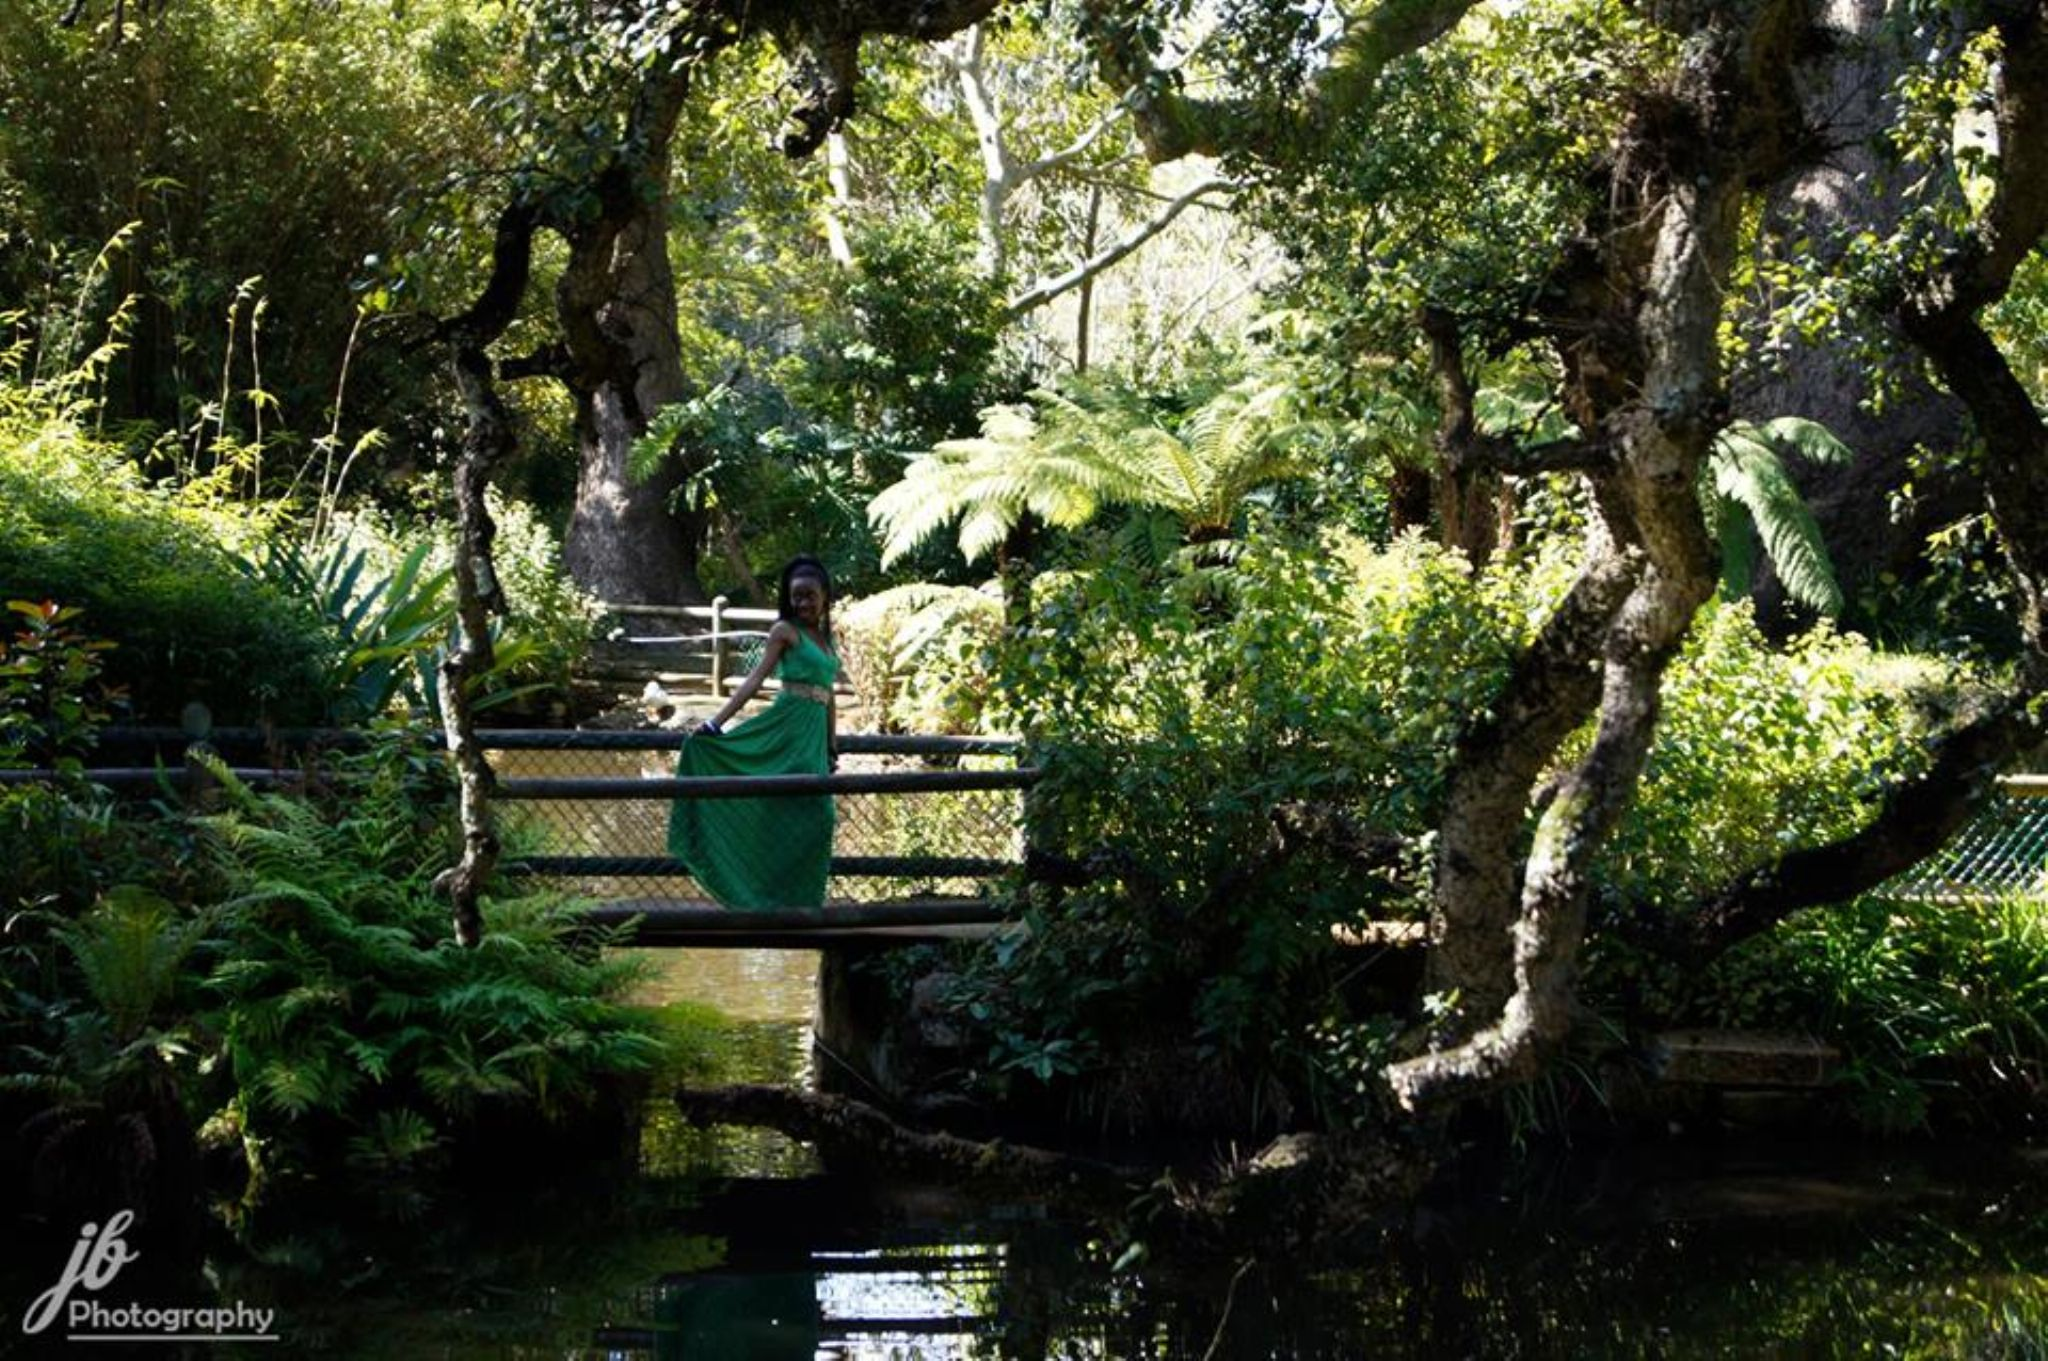 gardens by jtmagidivana